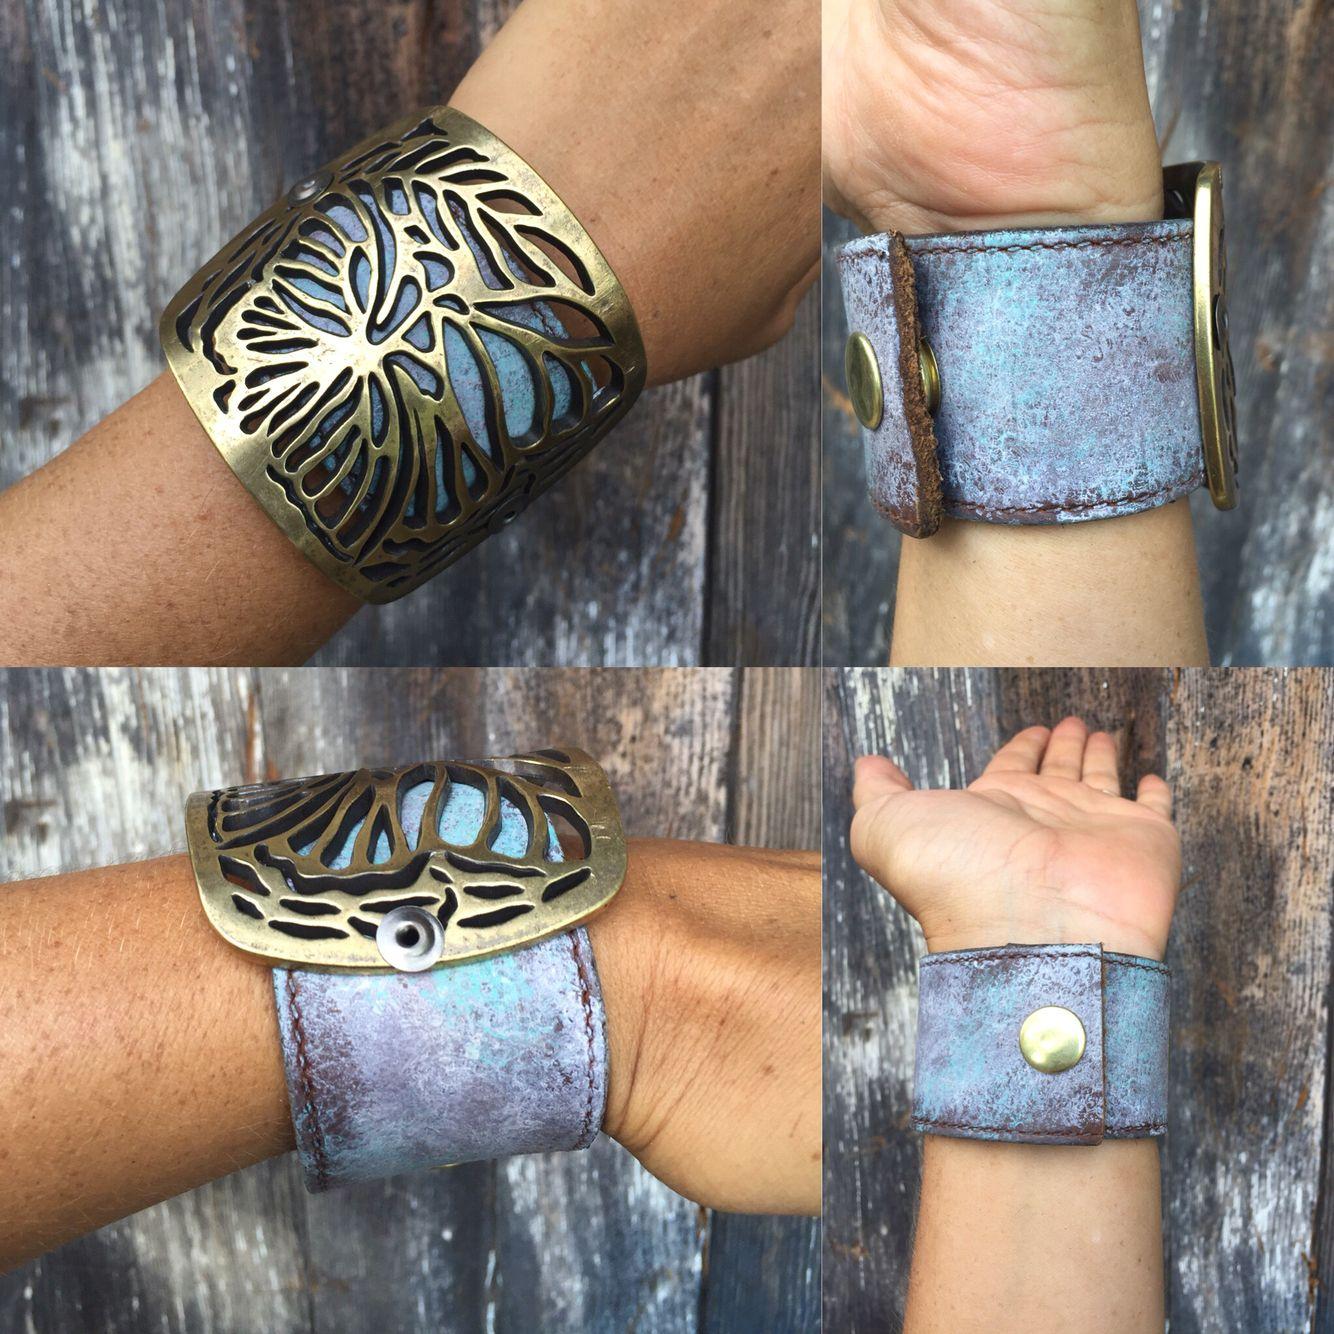 Painted belt cuff with repurposed belt buckle. Super cool and unique.  #SteelShopDesigns #cuff #beltcuff #leathercuff #cuffbracelet #ooak #ooakjewelry